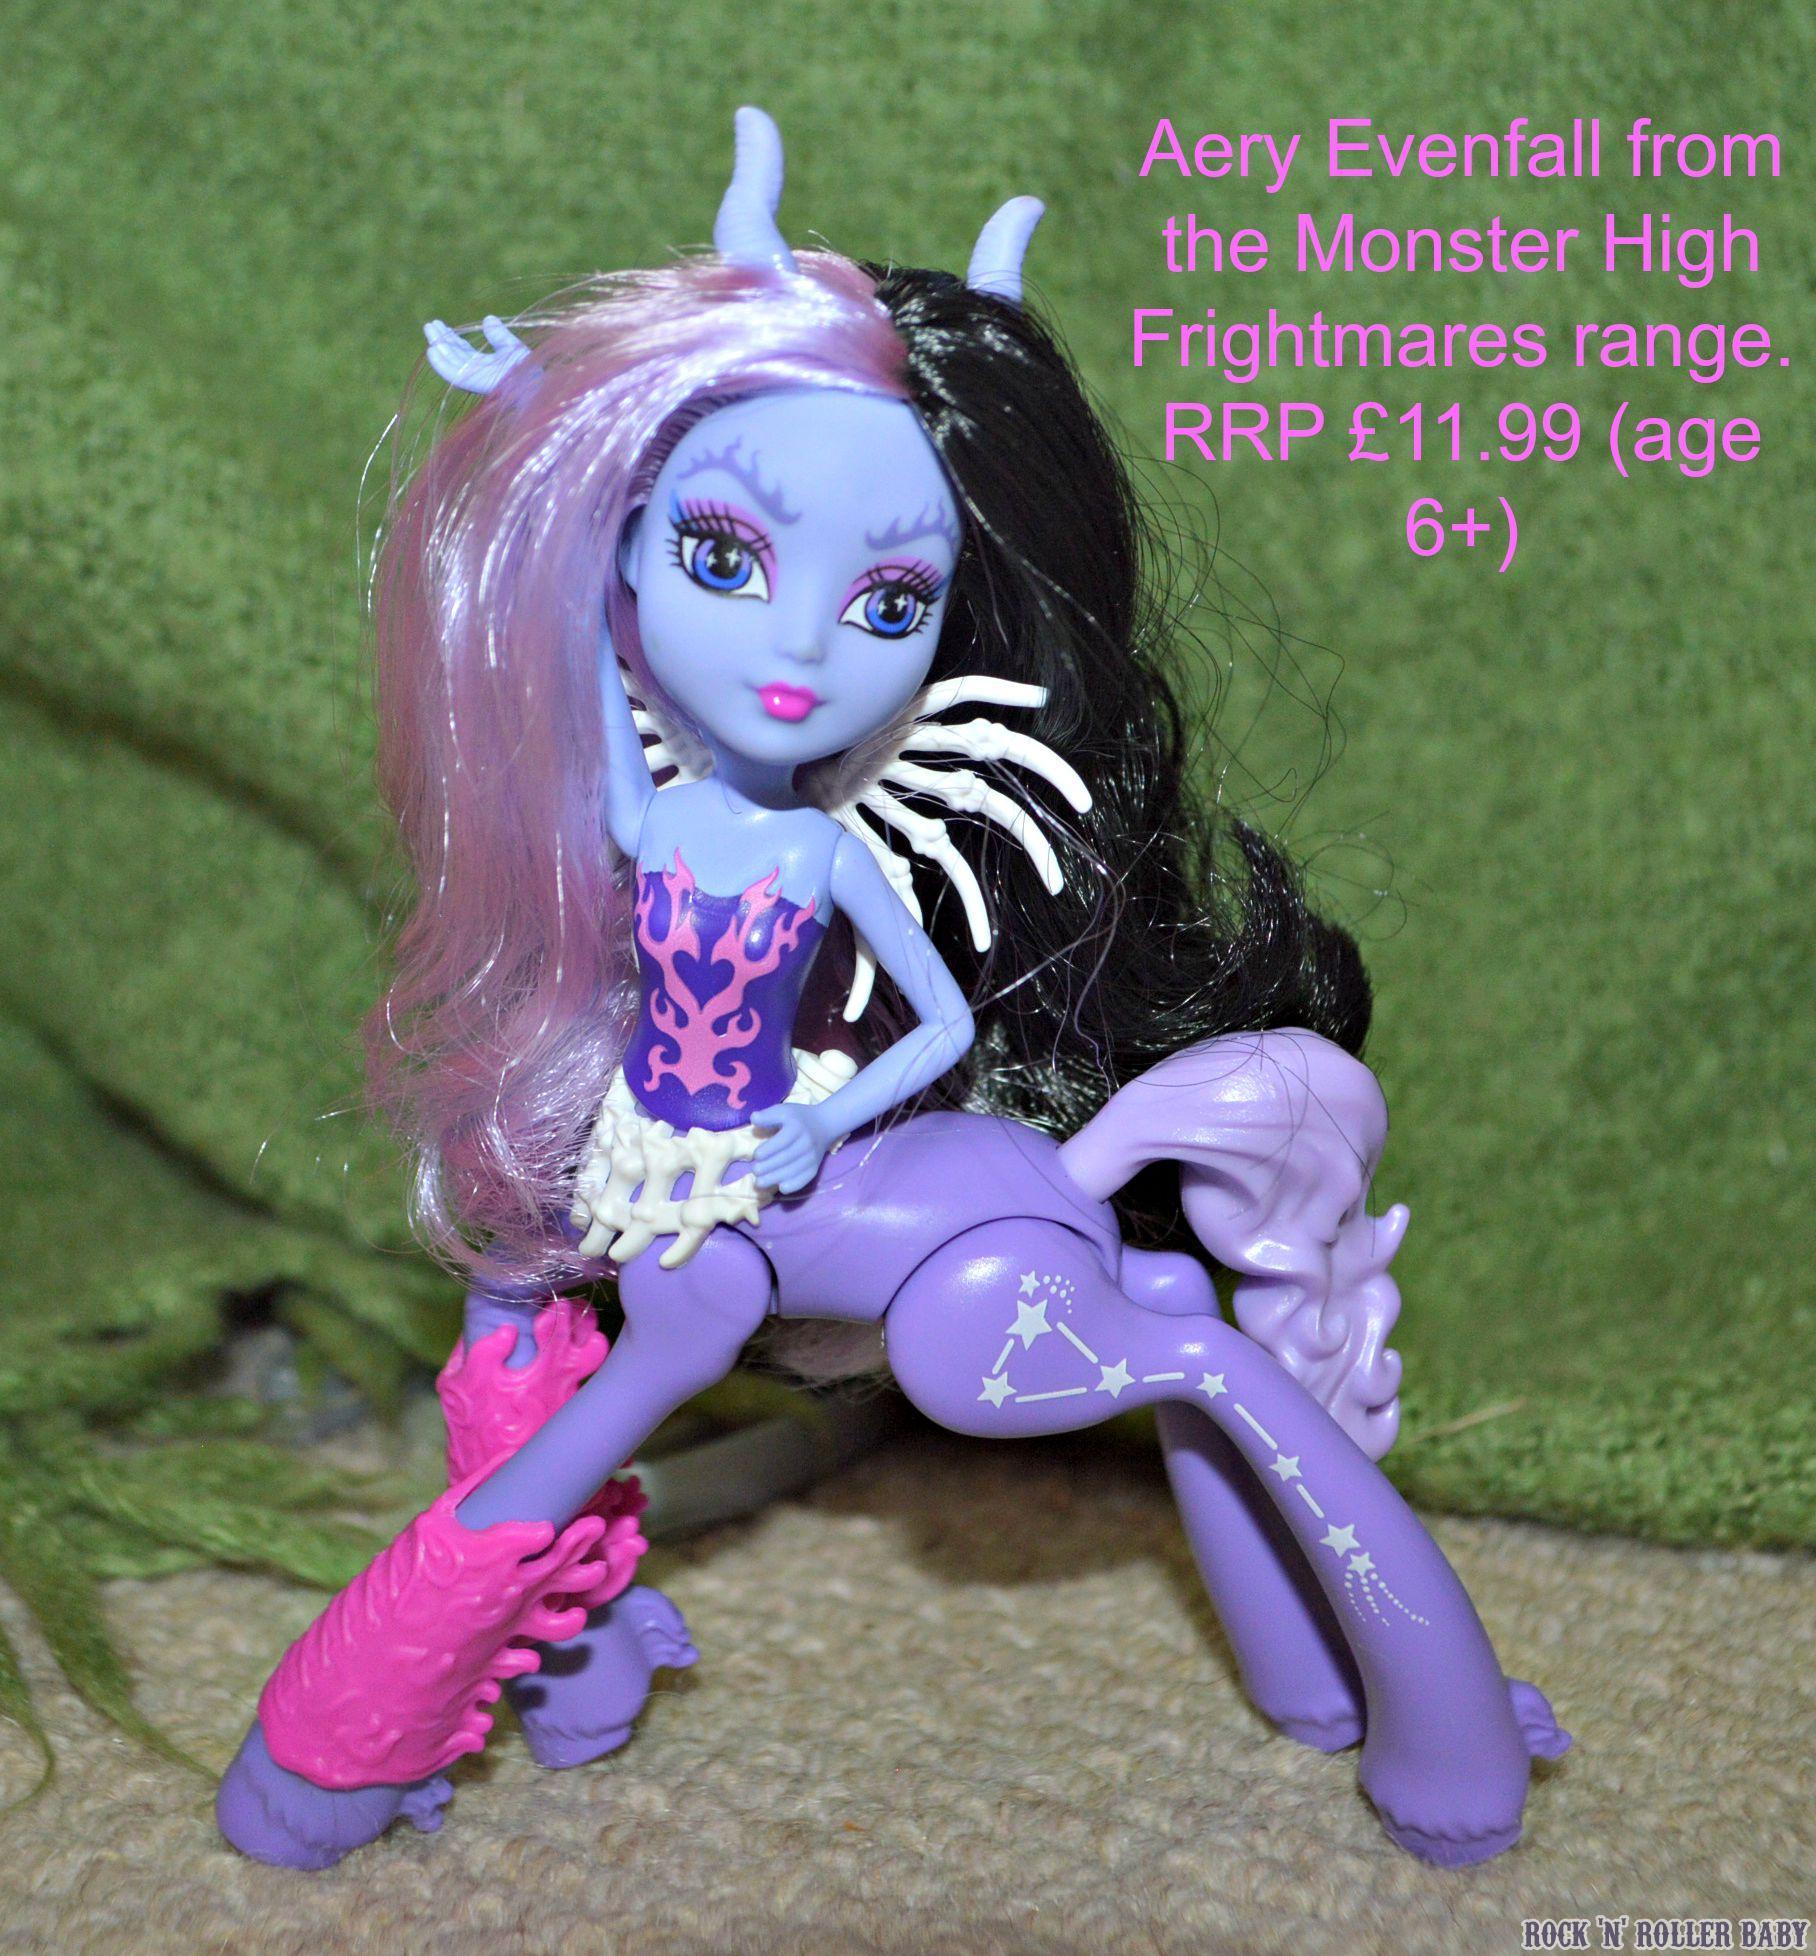 Monster High Frightmares Centaurs Rocknrollerbaby